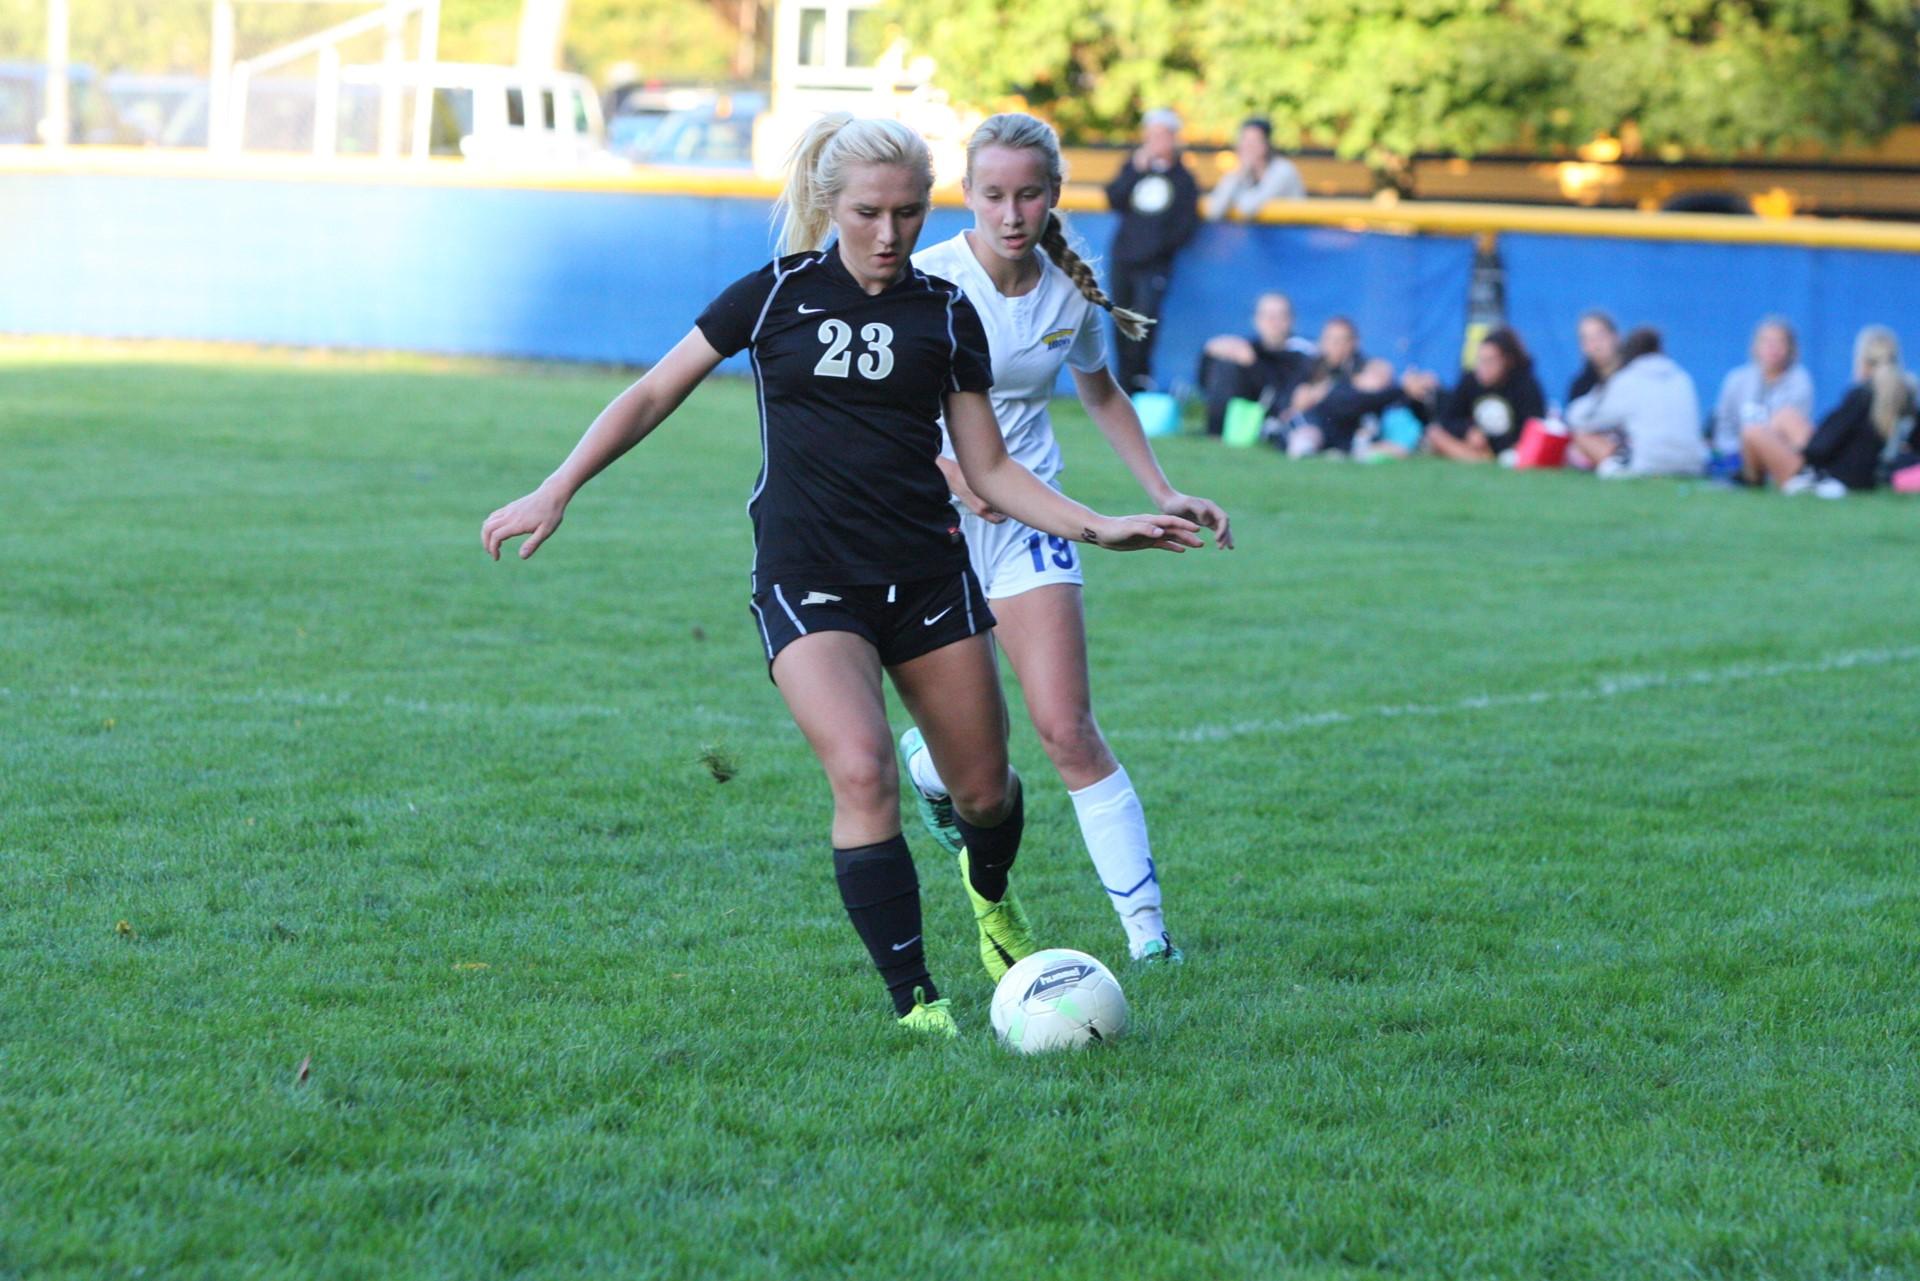 PHS student athlete kicking a soccer ball